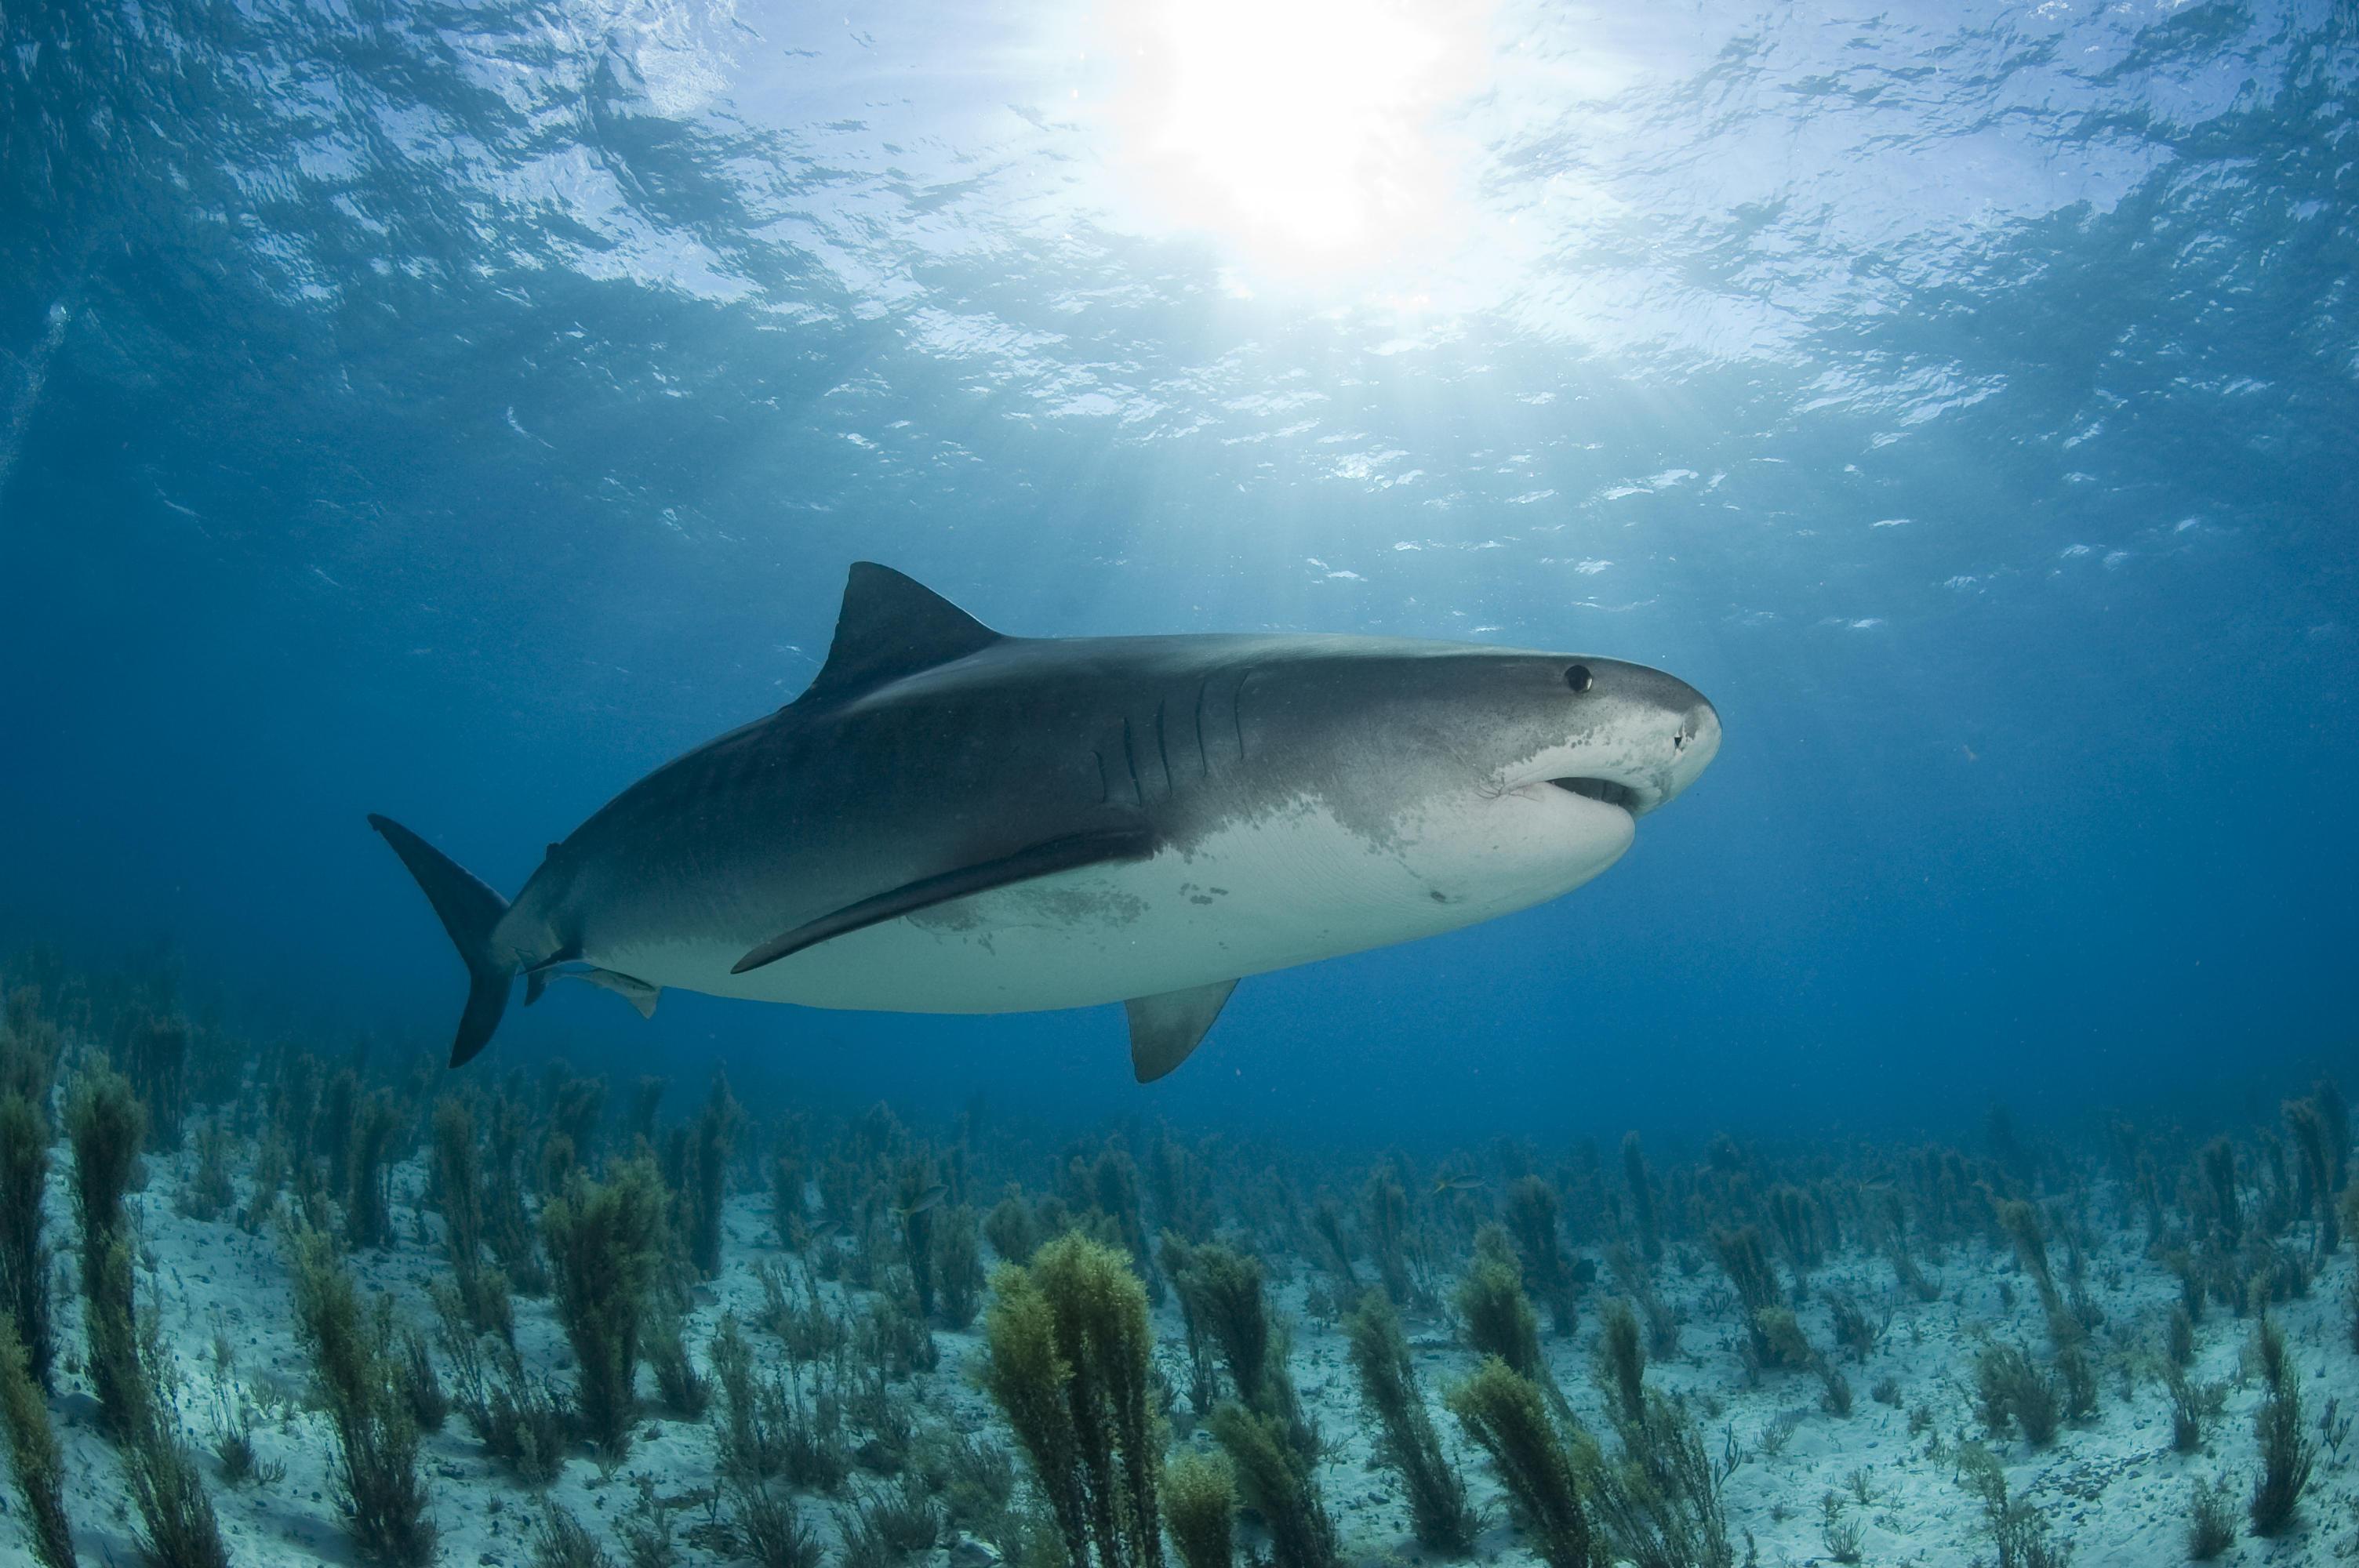 Happy shark chilling.